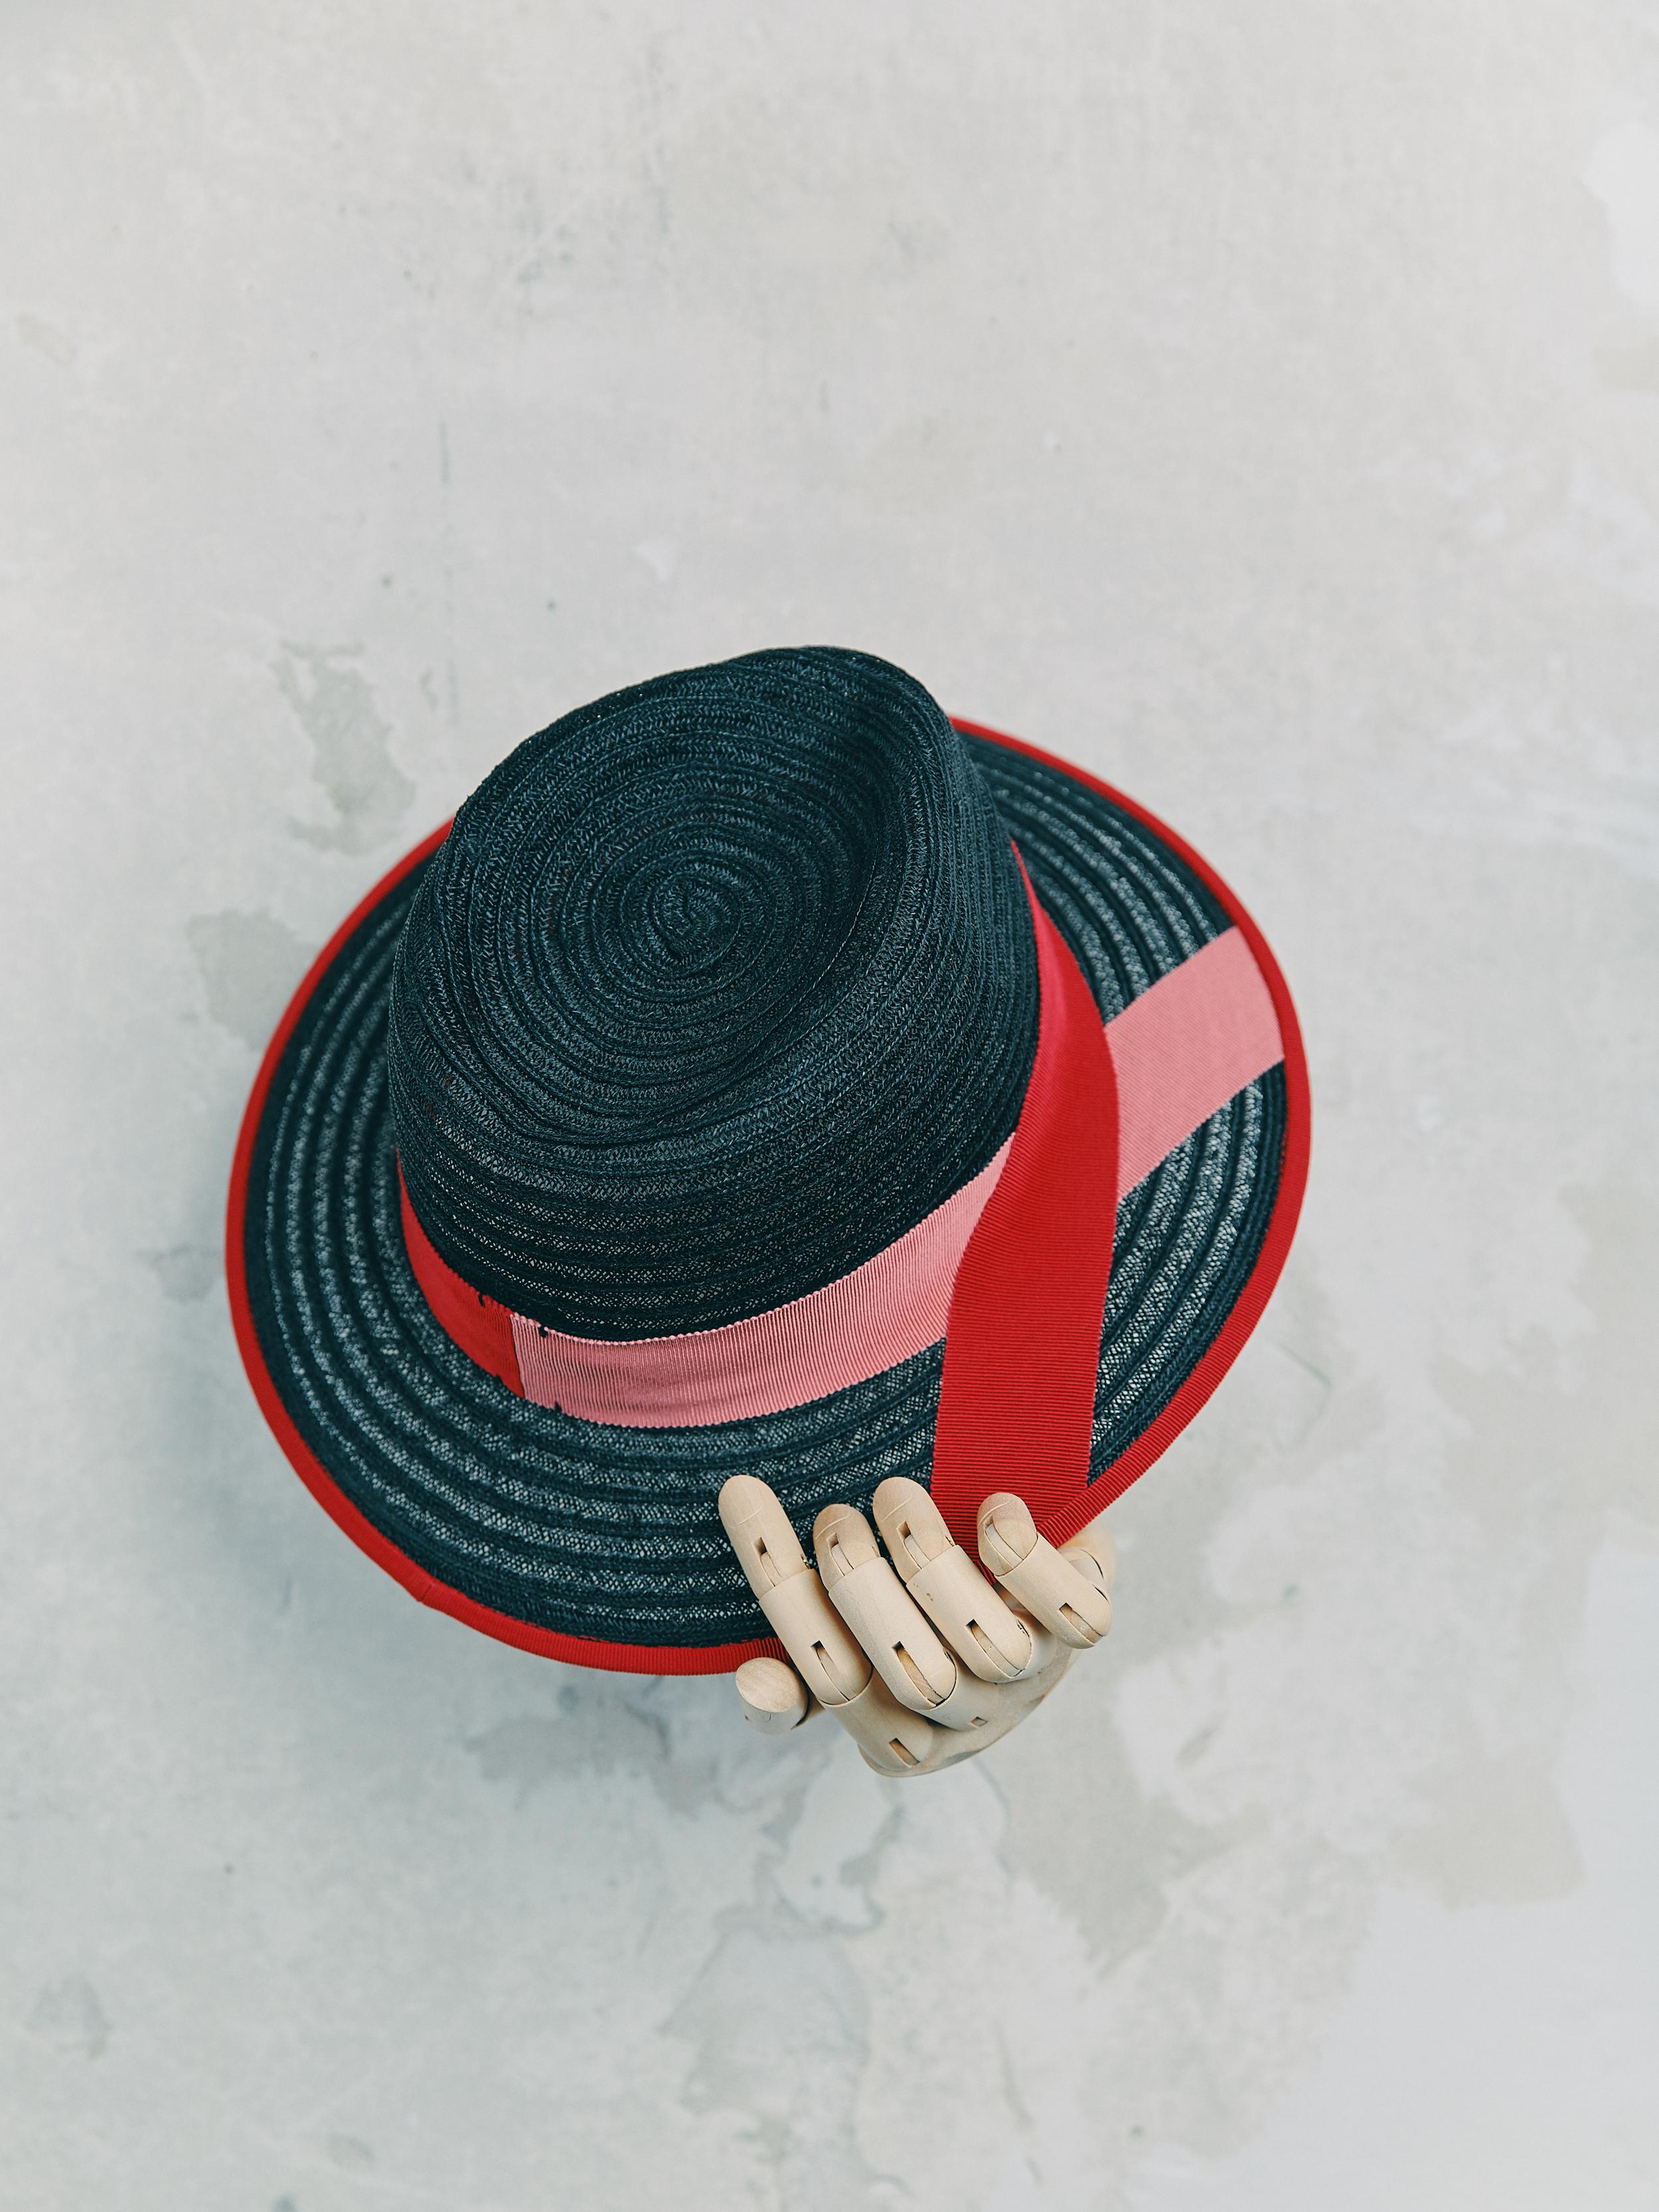 CANOTIER - Bleu Marine bordé ruban Rouge